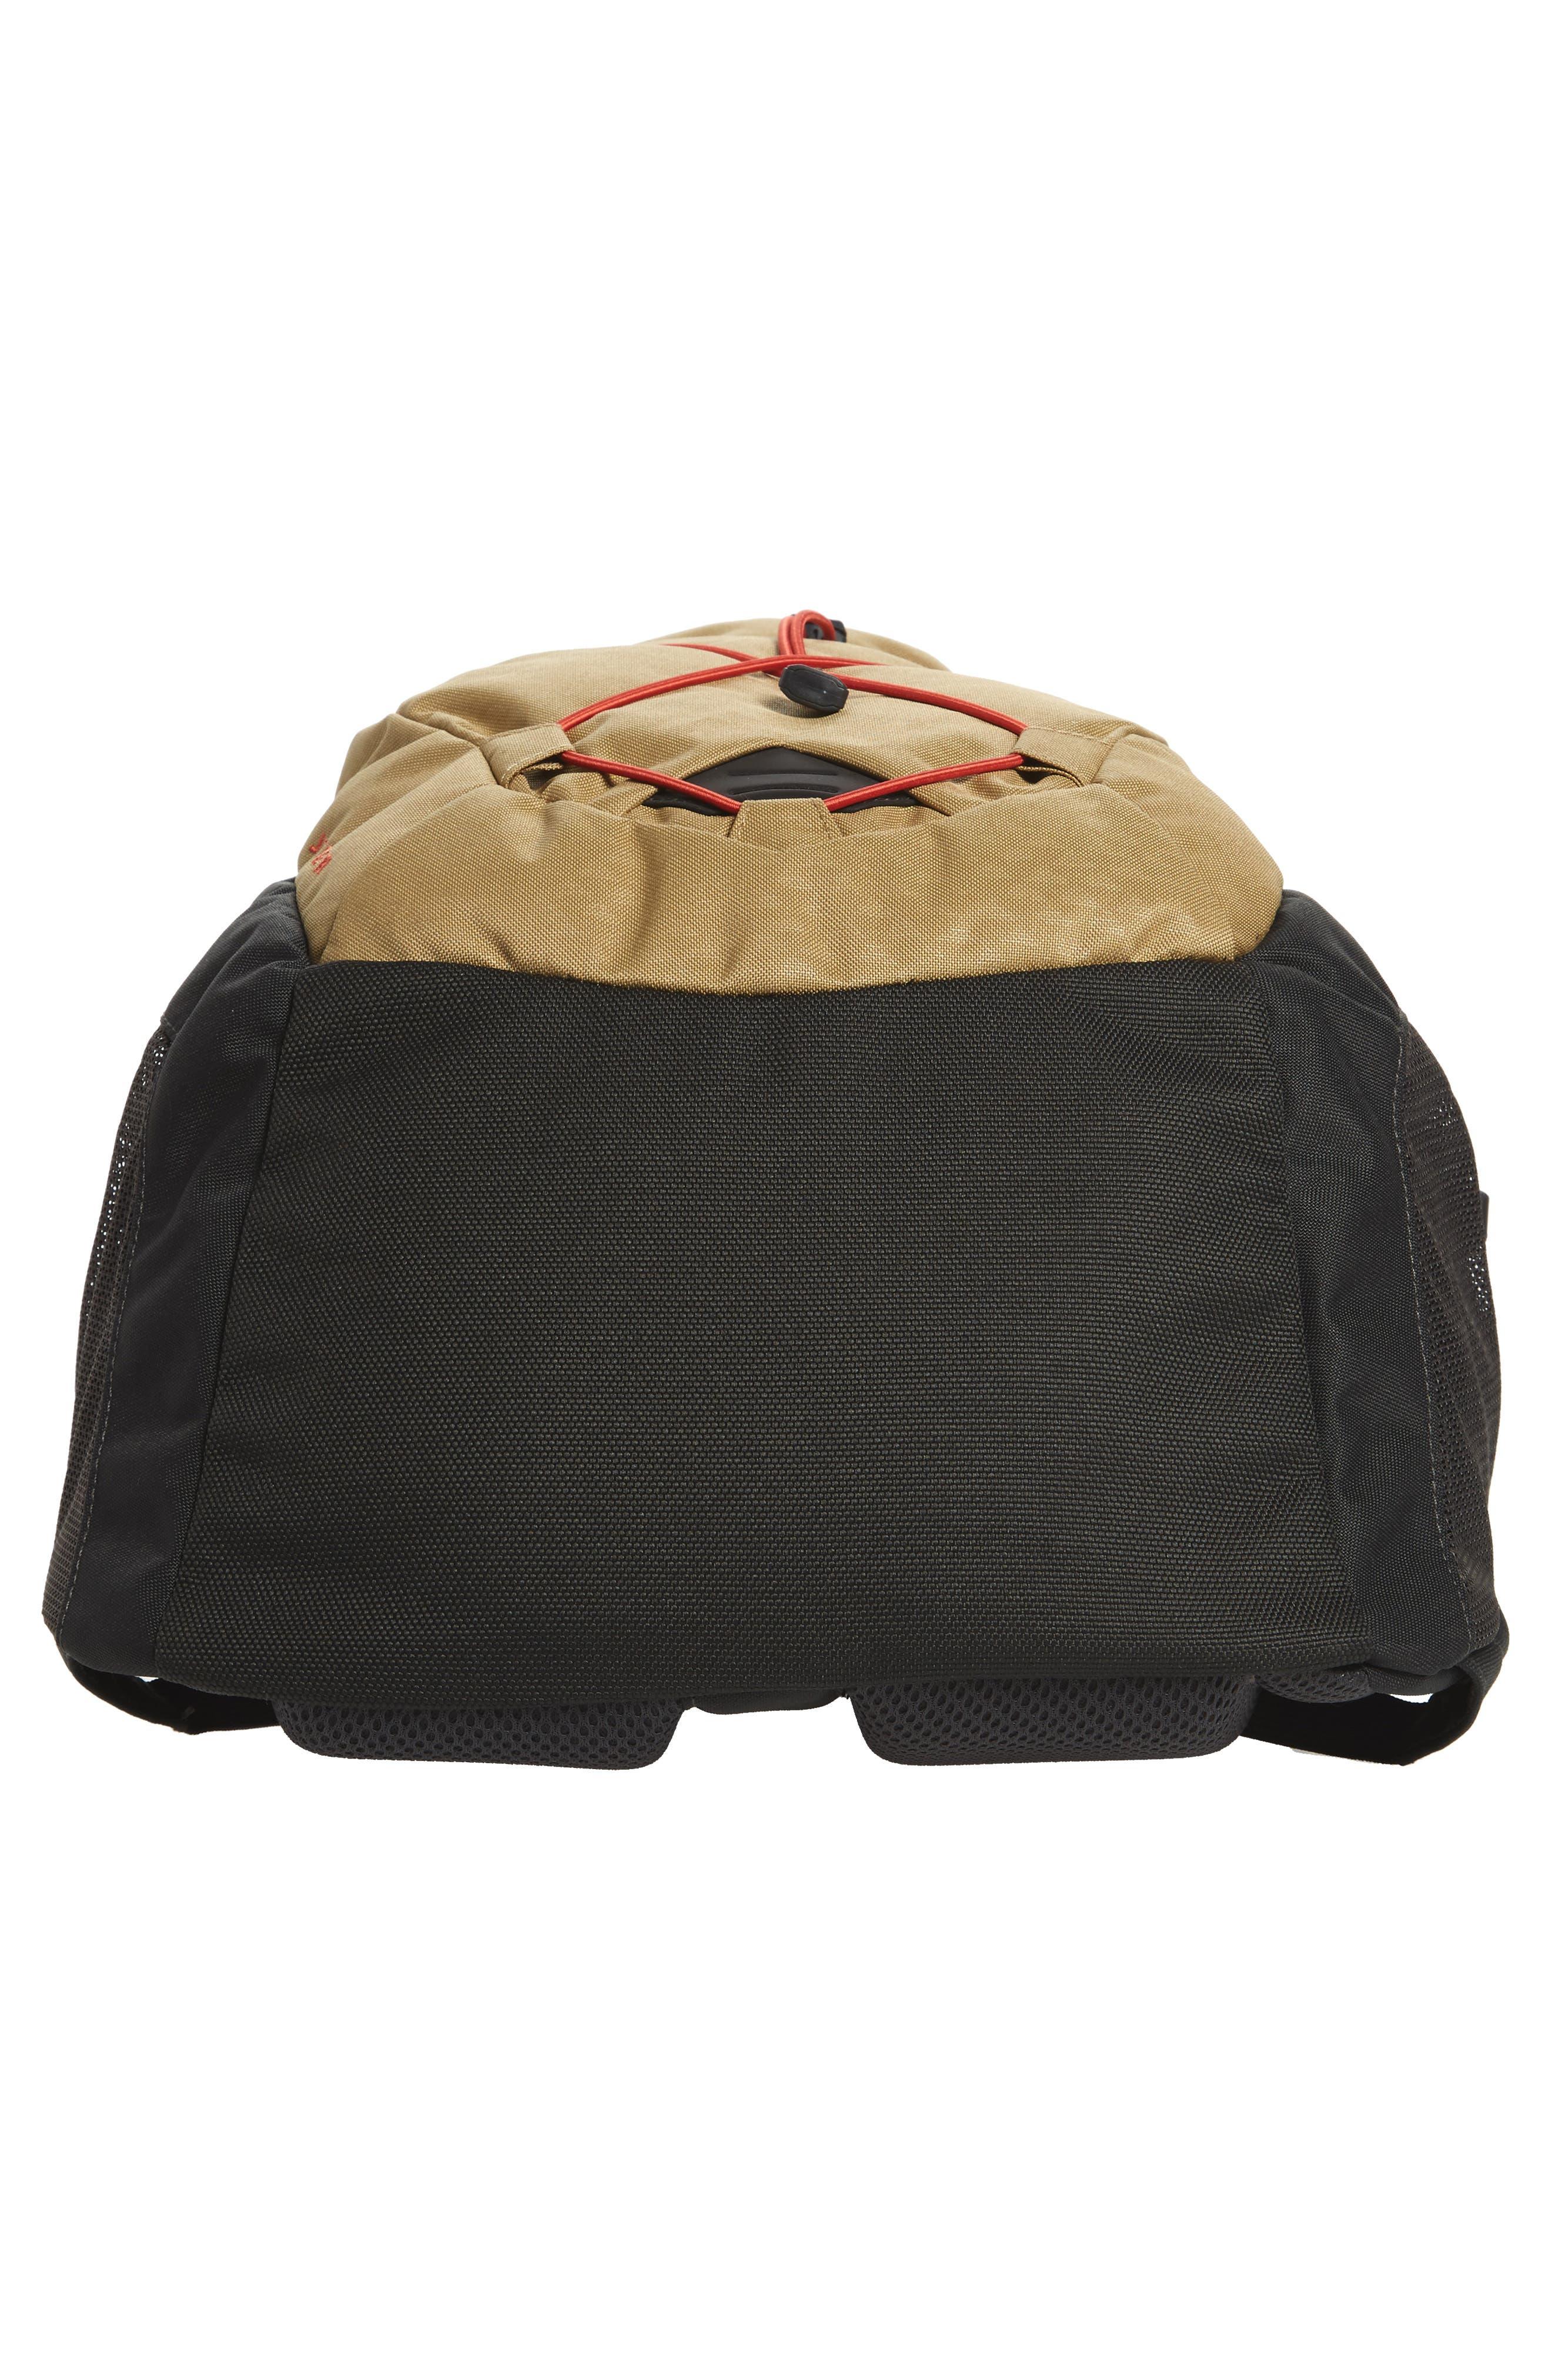 'Jester' Backpack,                             Alternate thumbnail 108, color,